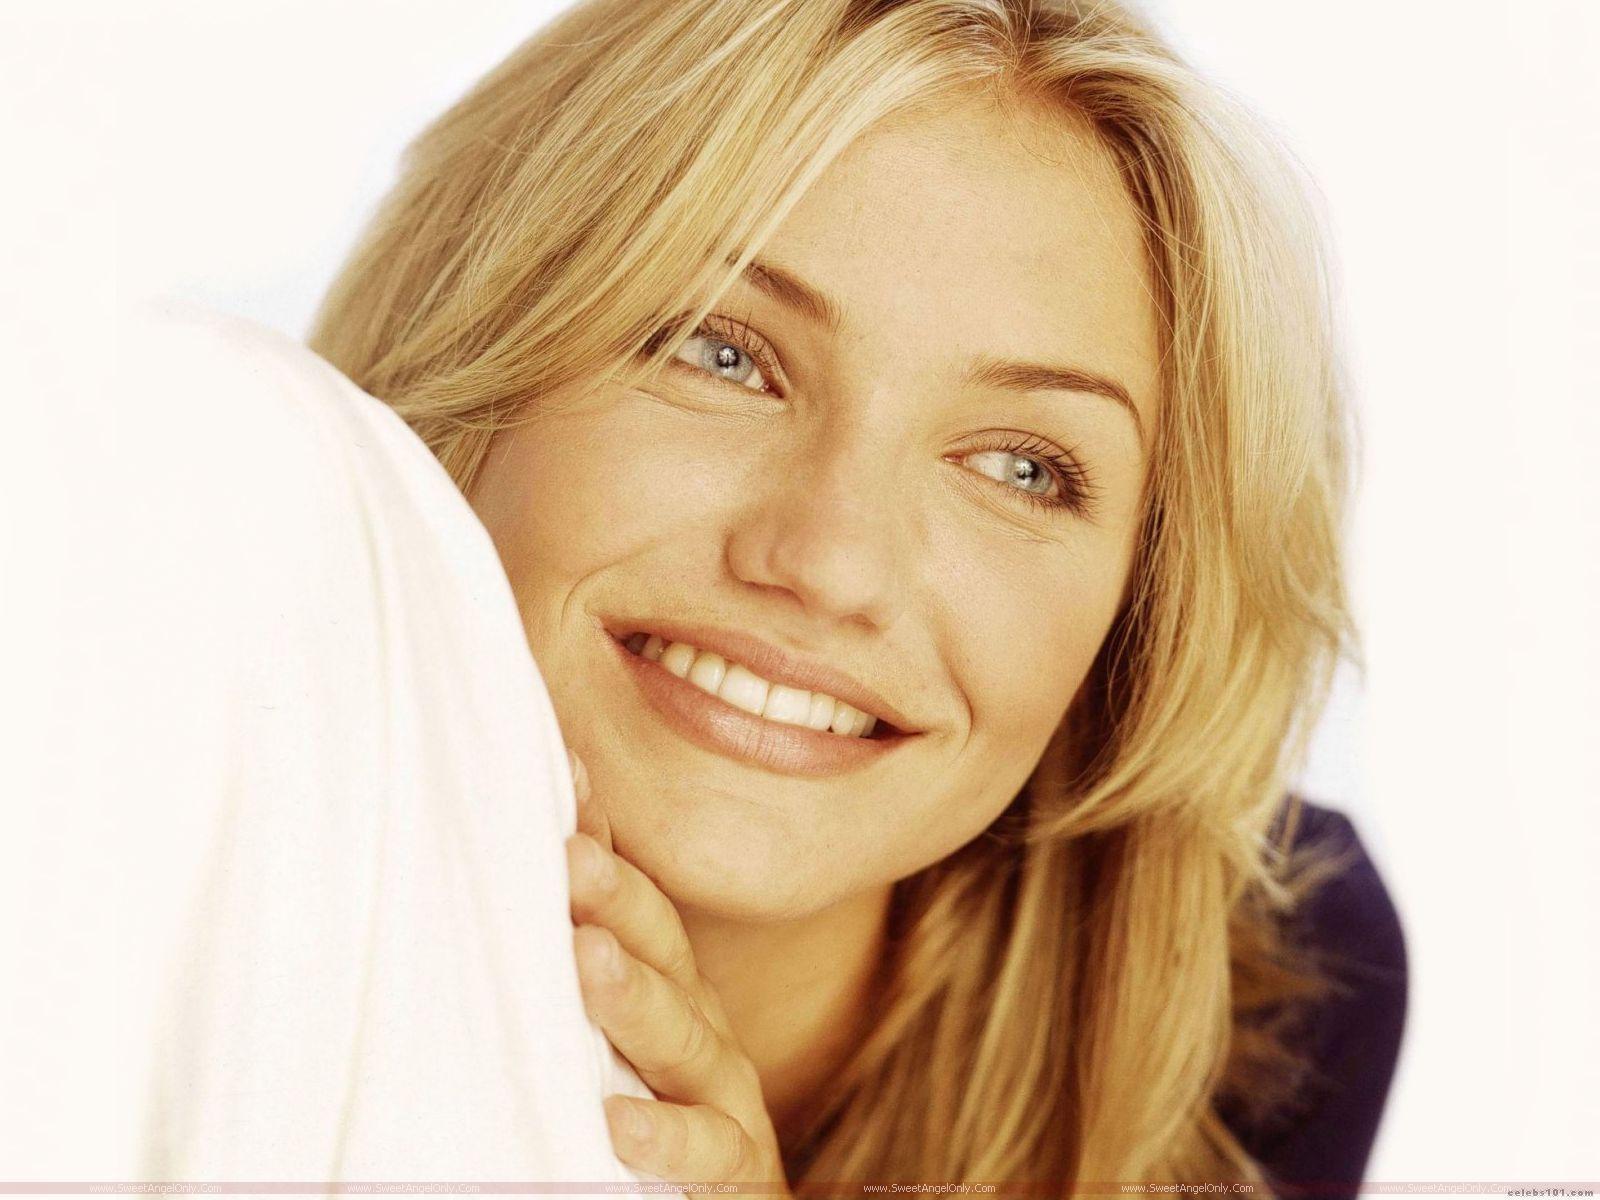 http://3.bp.blogspot.com/-SVGYOePNyCk/Tja53lhAQ1I/AAAAAAAAH9A/SmrE0JixdjM/s1600/Cameron_Diaz_sweet_smile.jpg